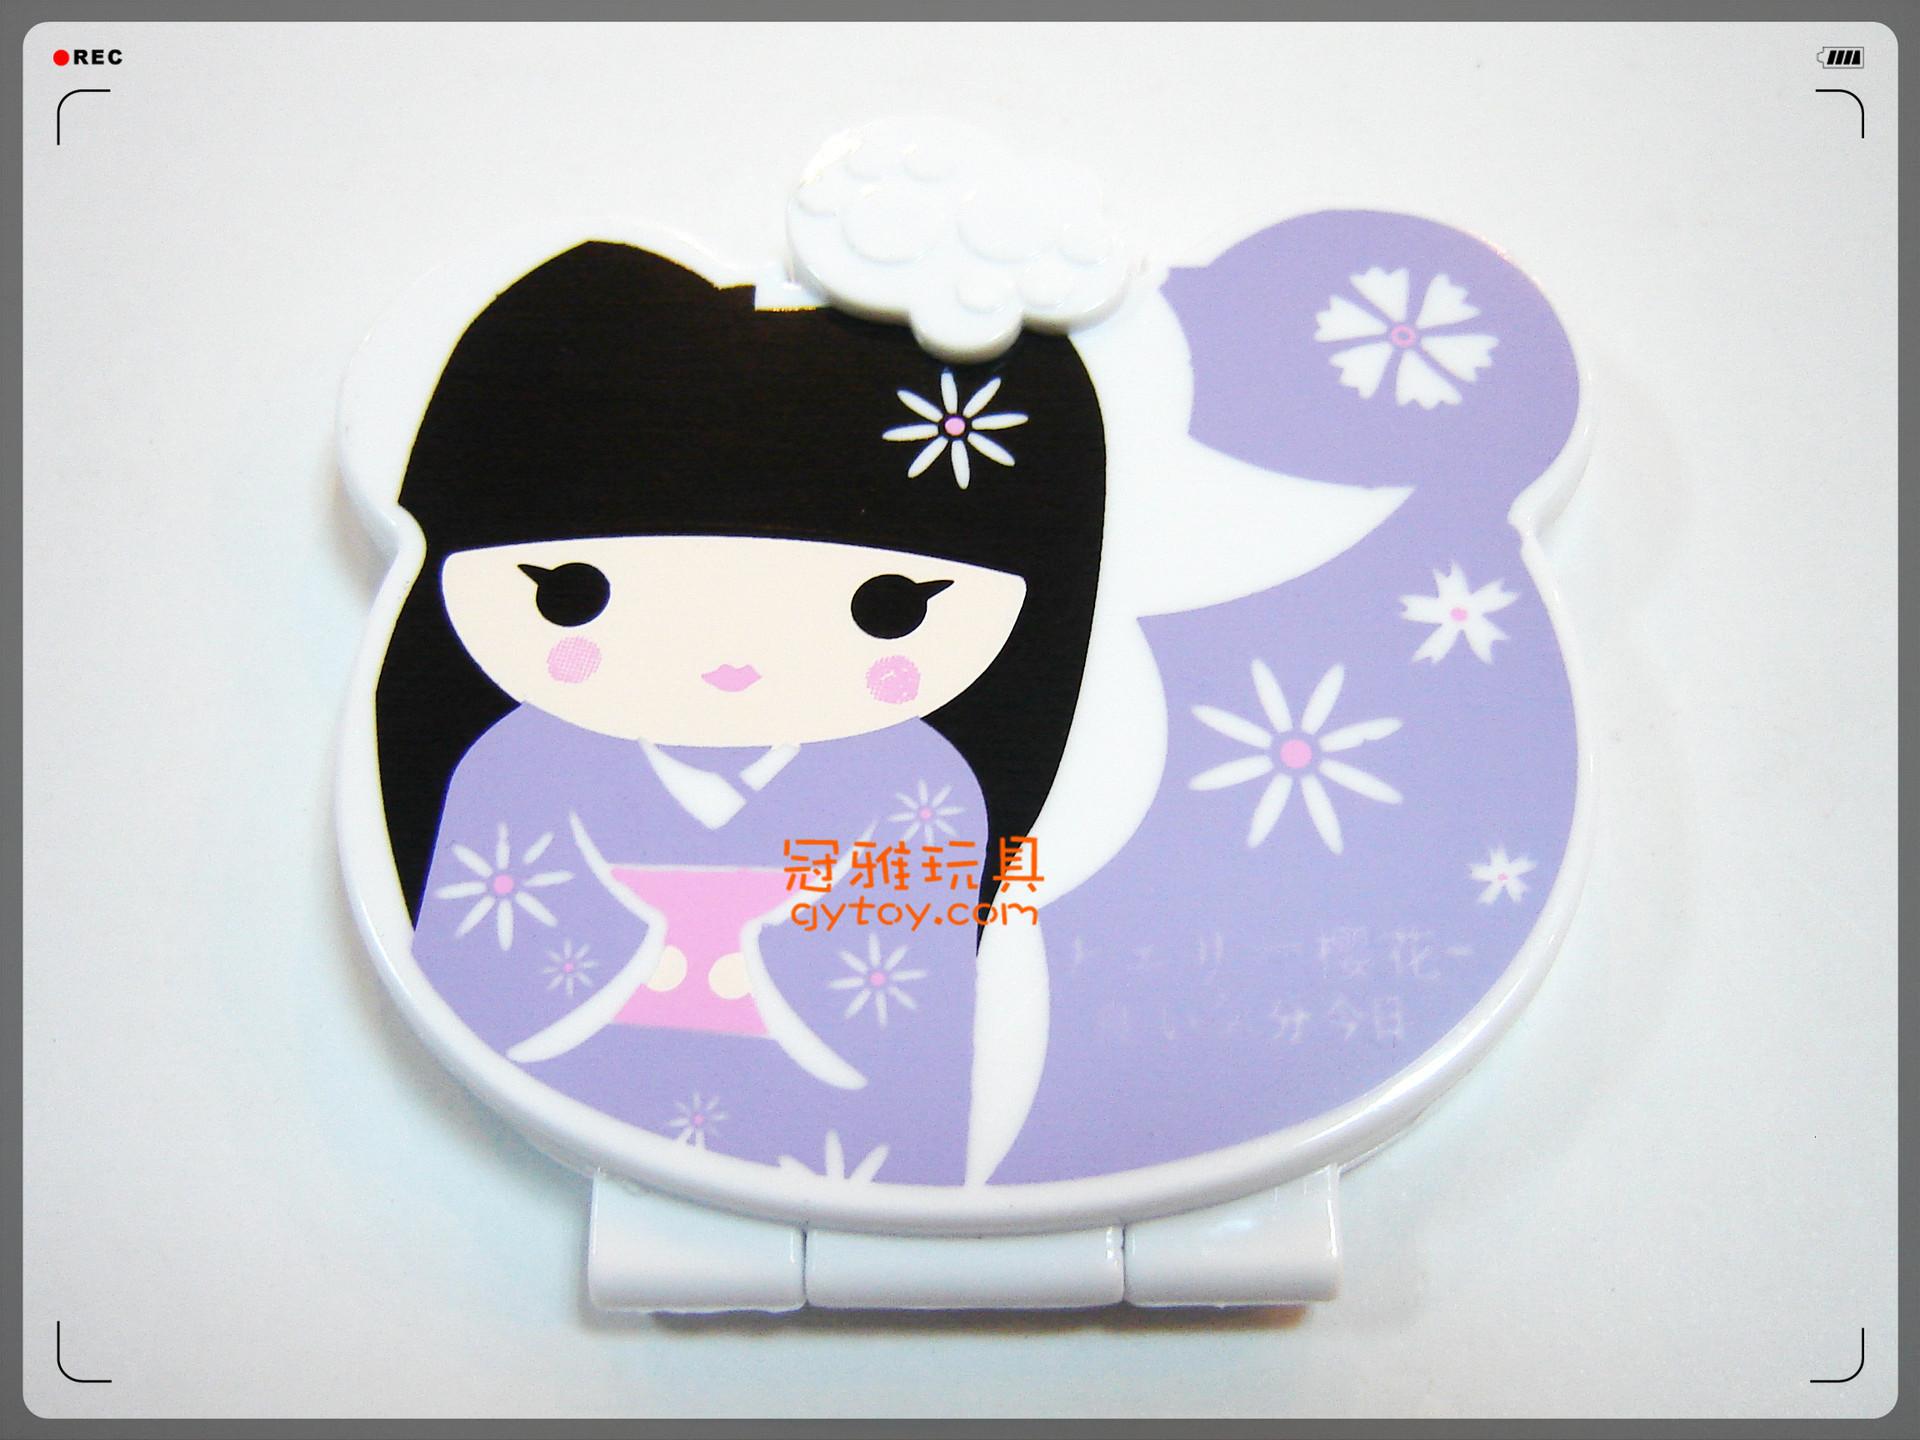 【9*8.5cm日本少女照片广告卡通夹镜子盒和服拳击女生成都图片